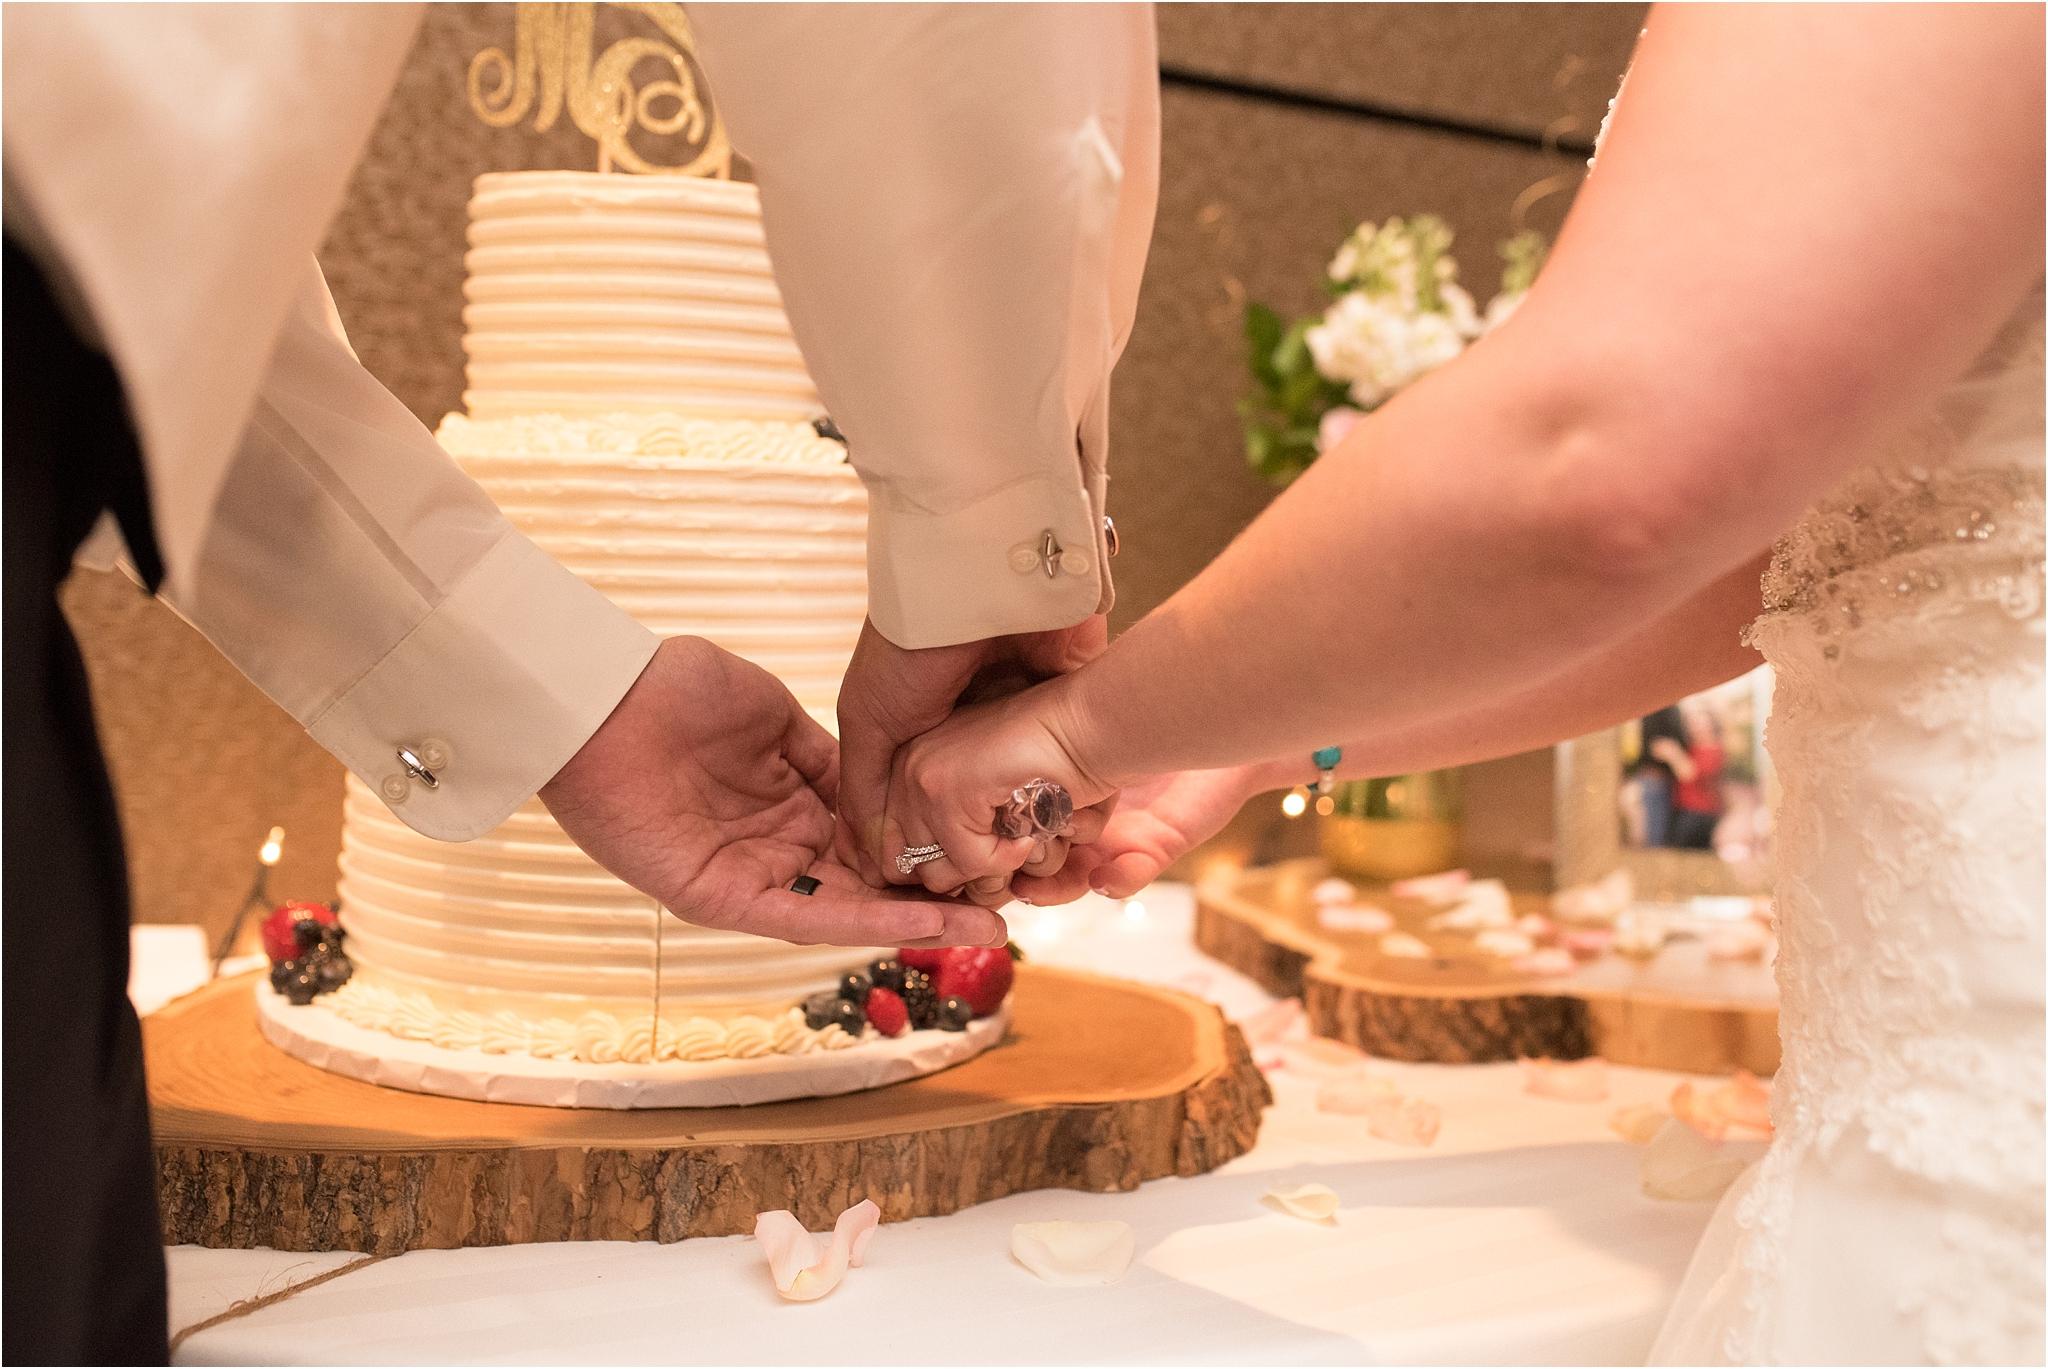 kayla kitts photography - isleta casino wedding - albuquerque wedding photographer - new mexico wedding photographer - de novo pastoral_0046.jpg